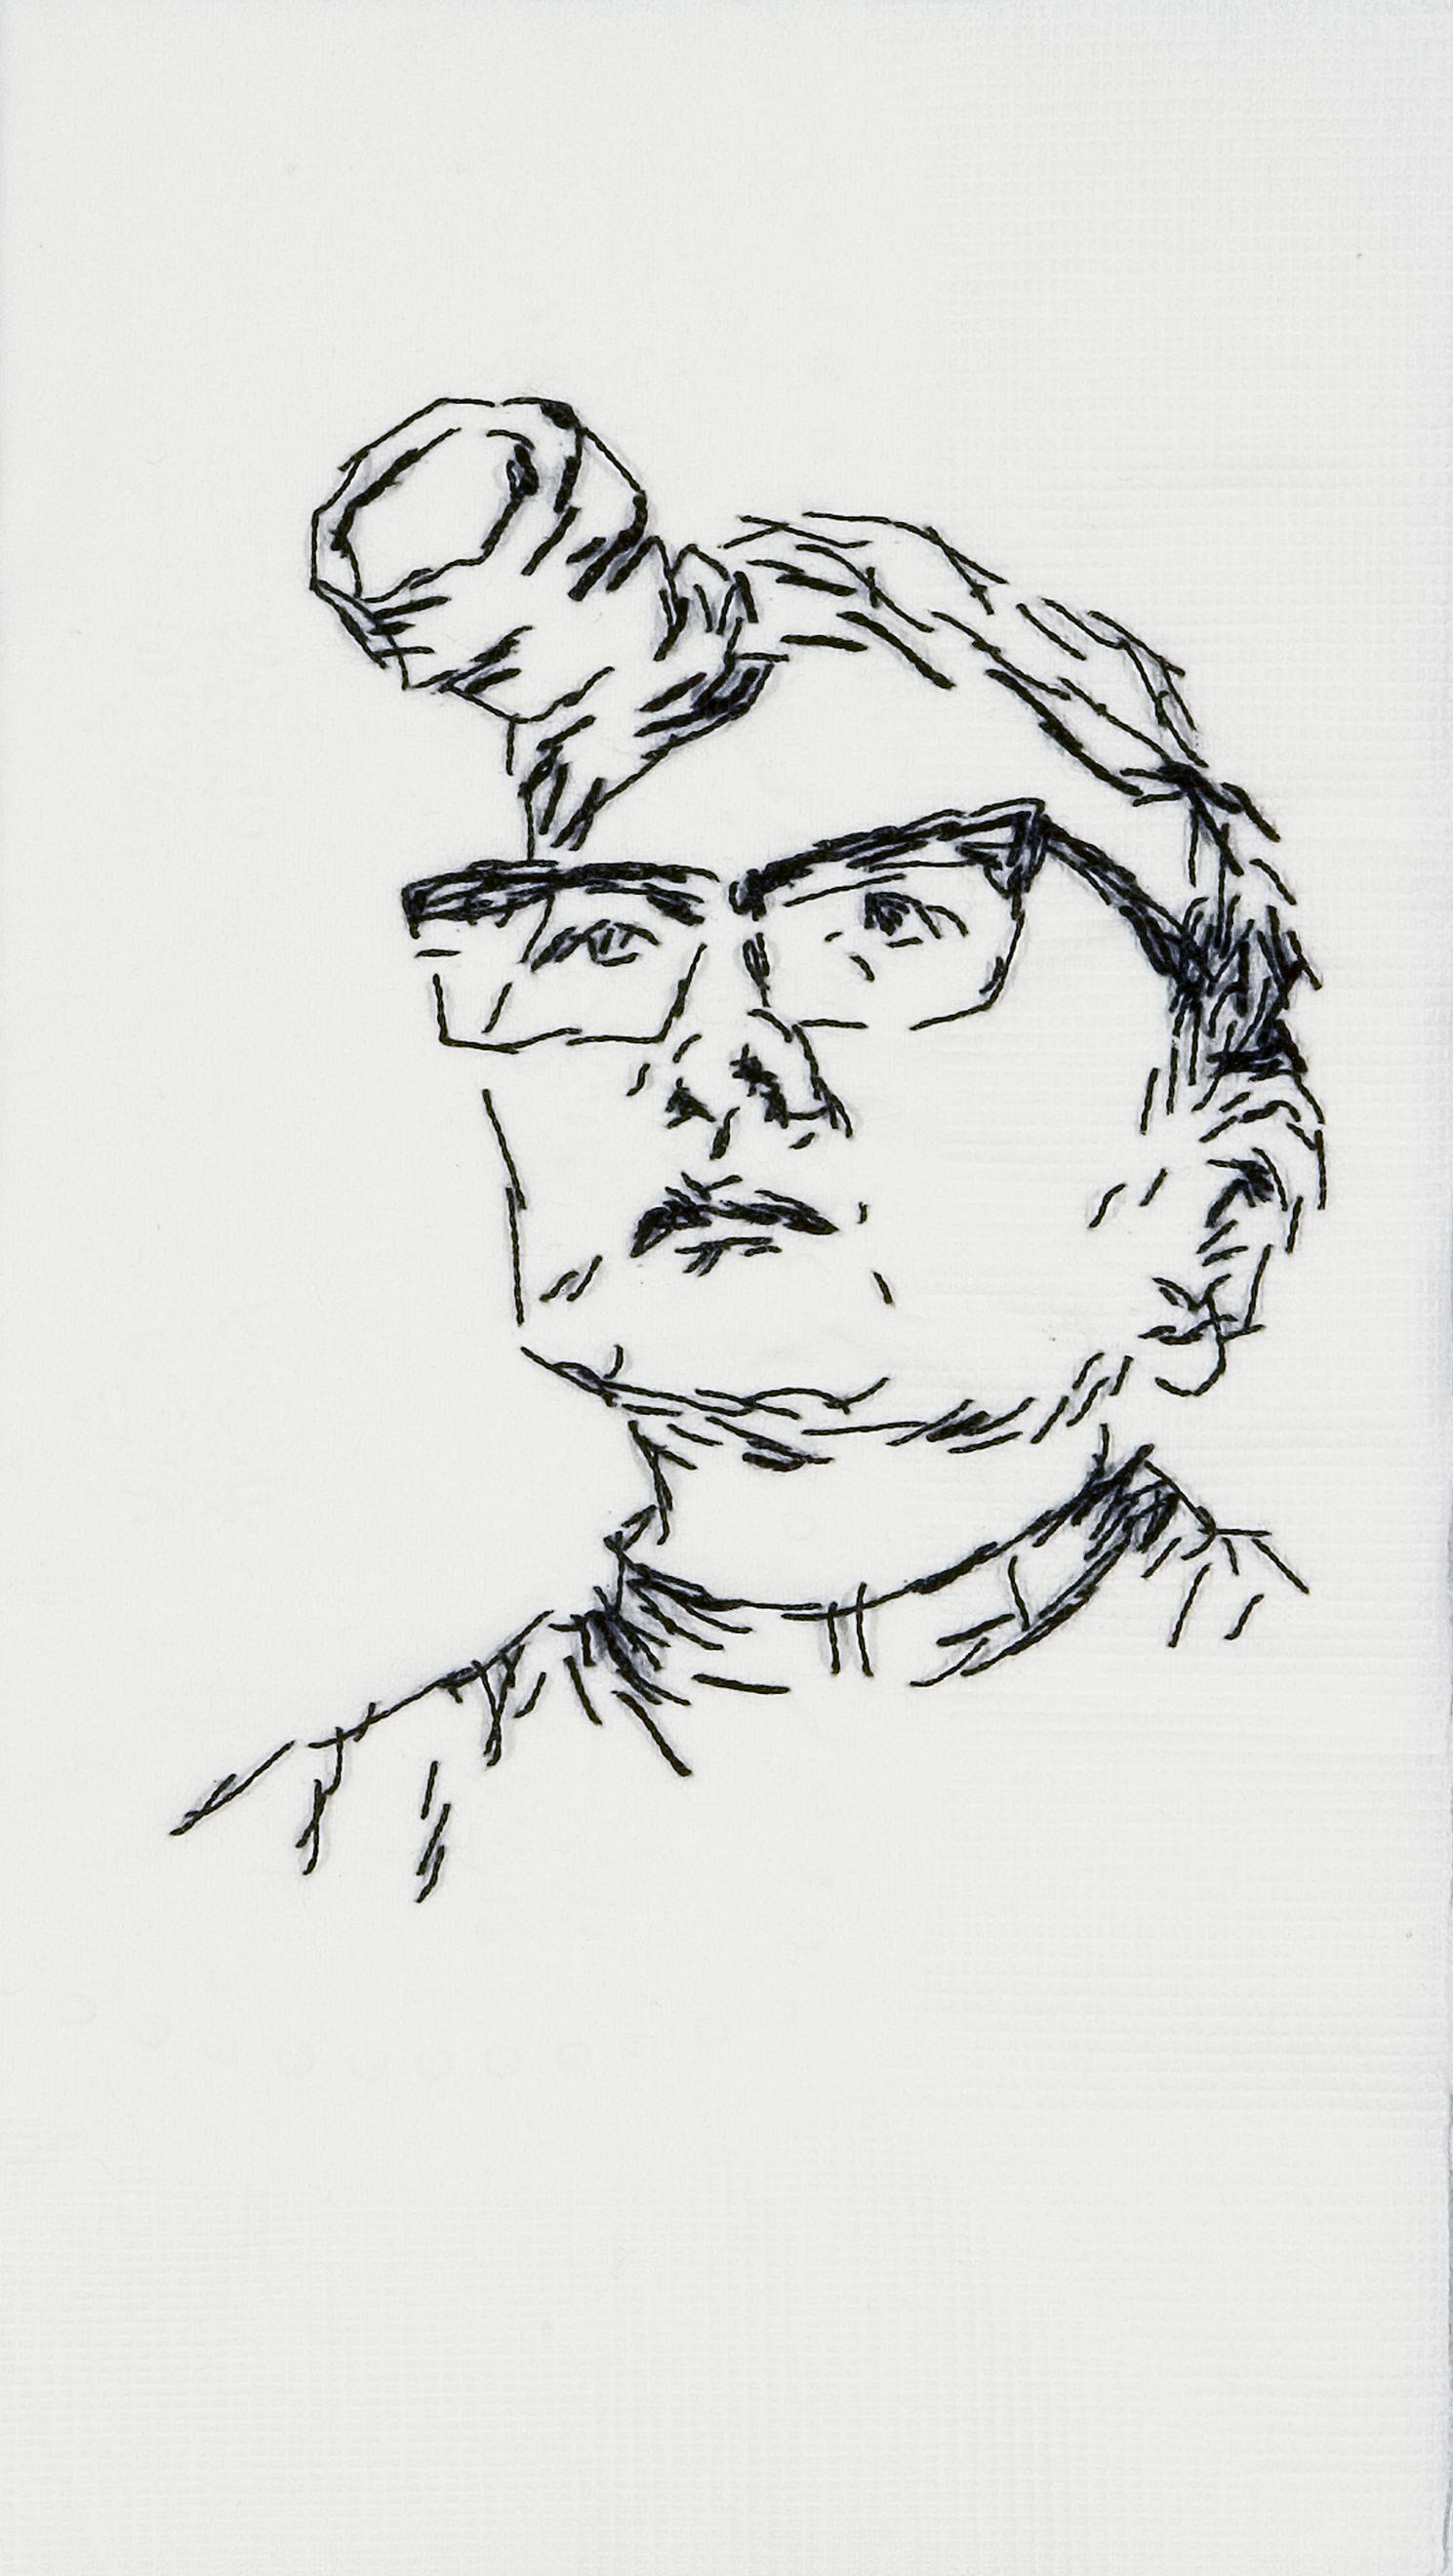 "Tina  Black thread on paper napkin, 7"" x 4"", 2008"